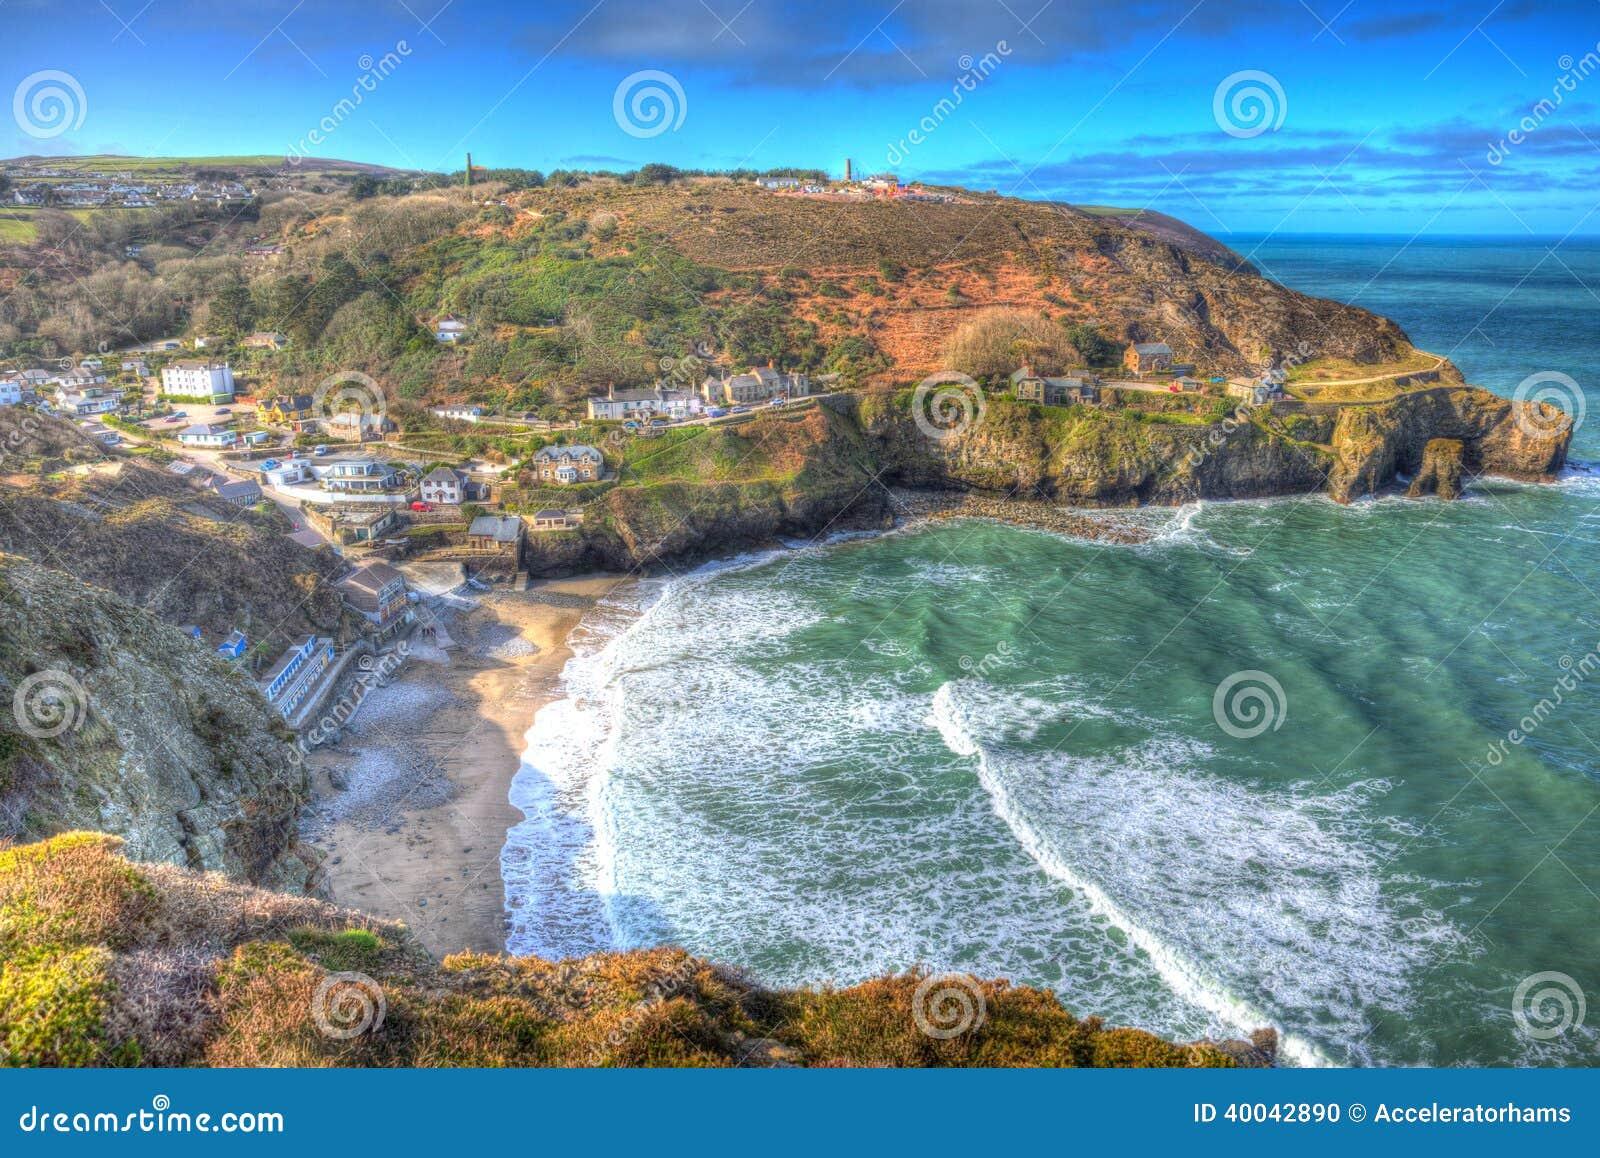 Saint Agnes United Kingdom  City pictures : ondeggia la st Agnes Cornwall England United Kingdom fra Newquay e St ...